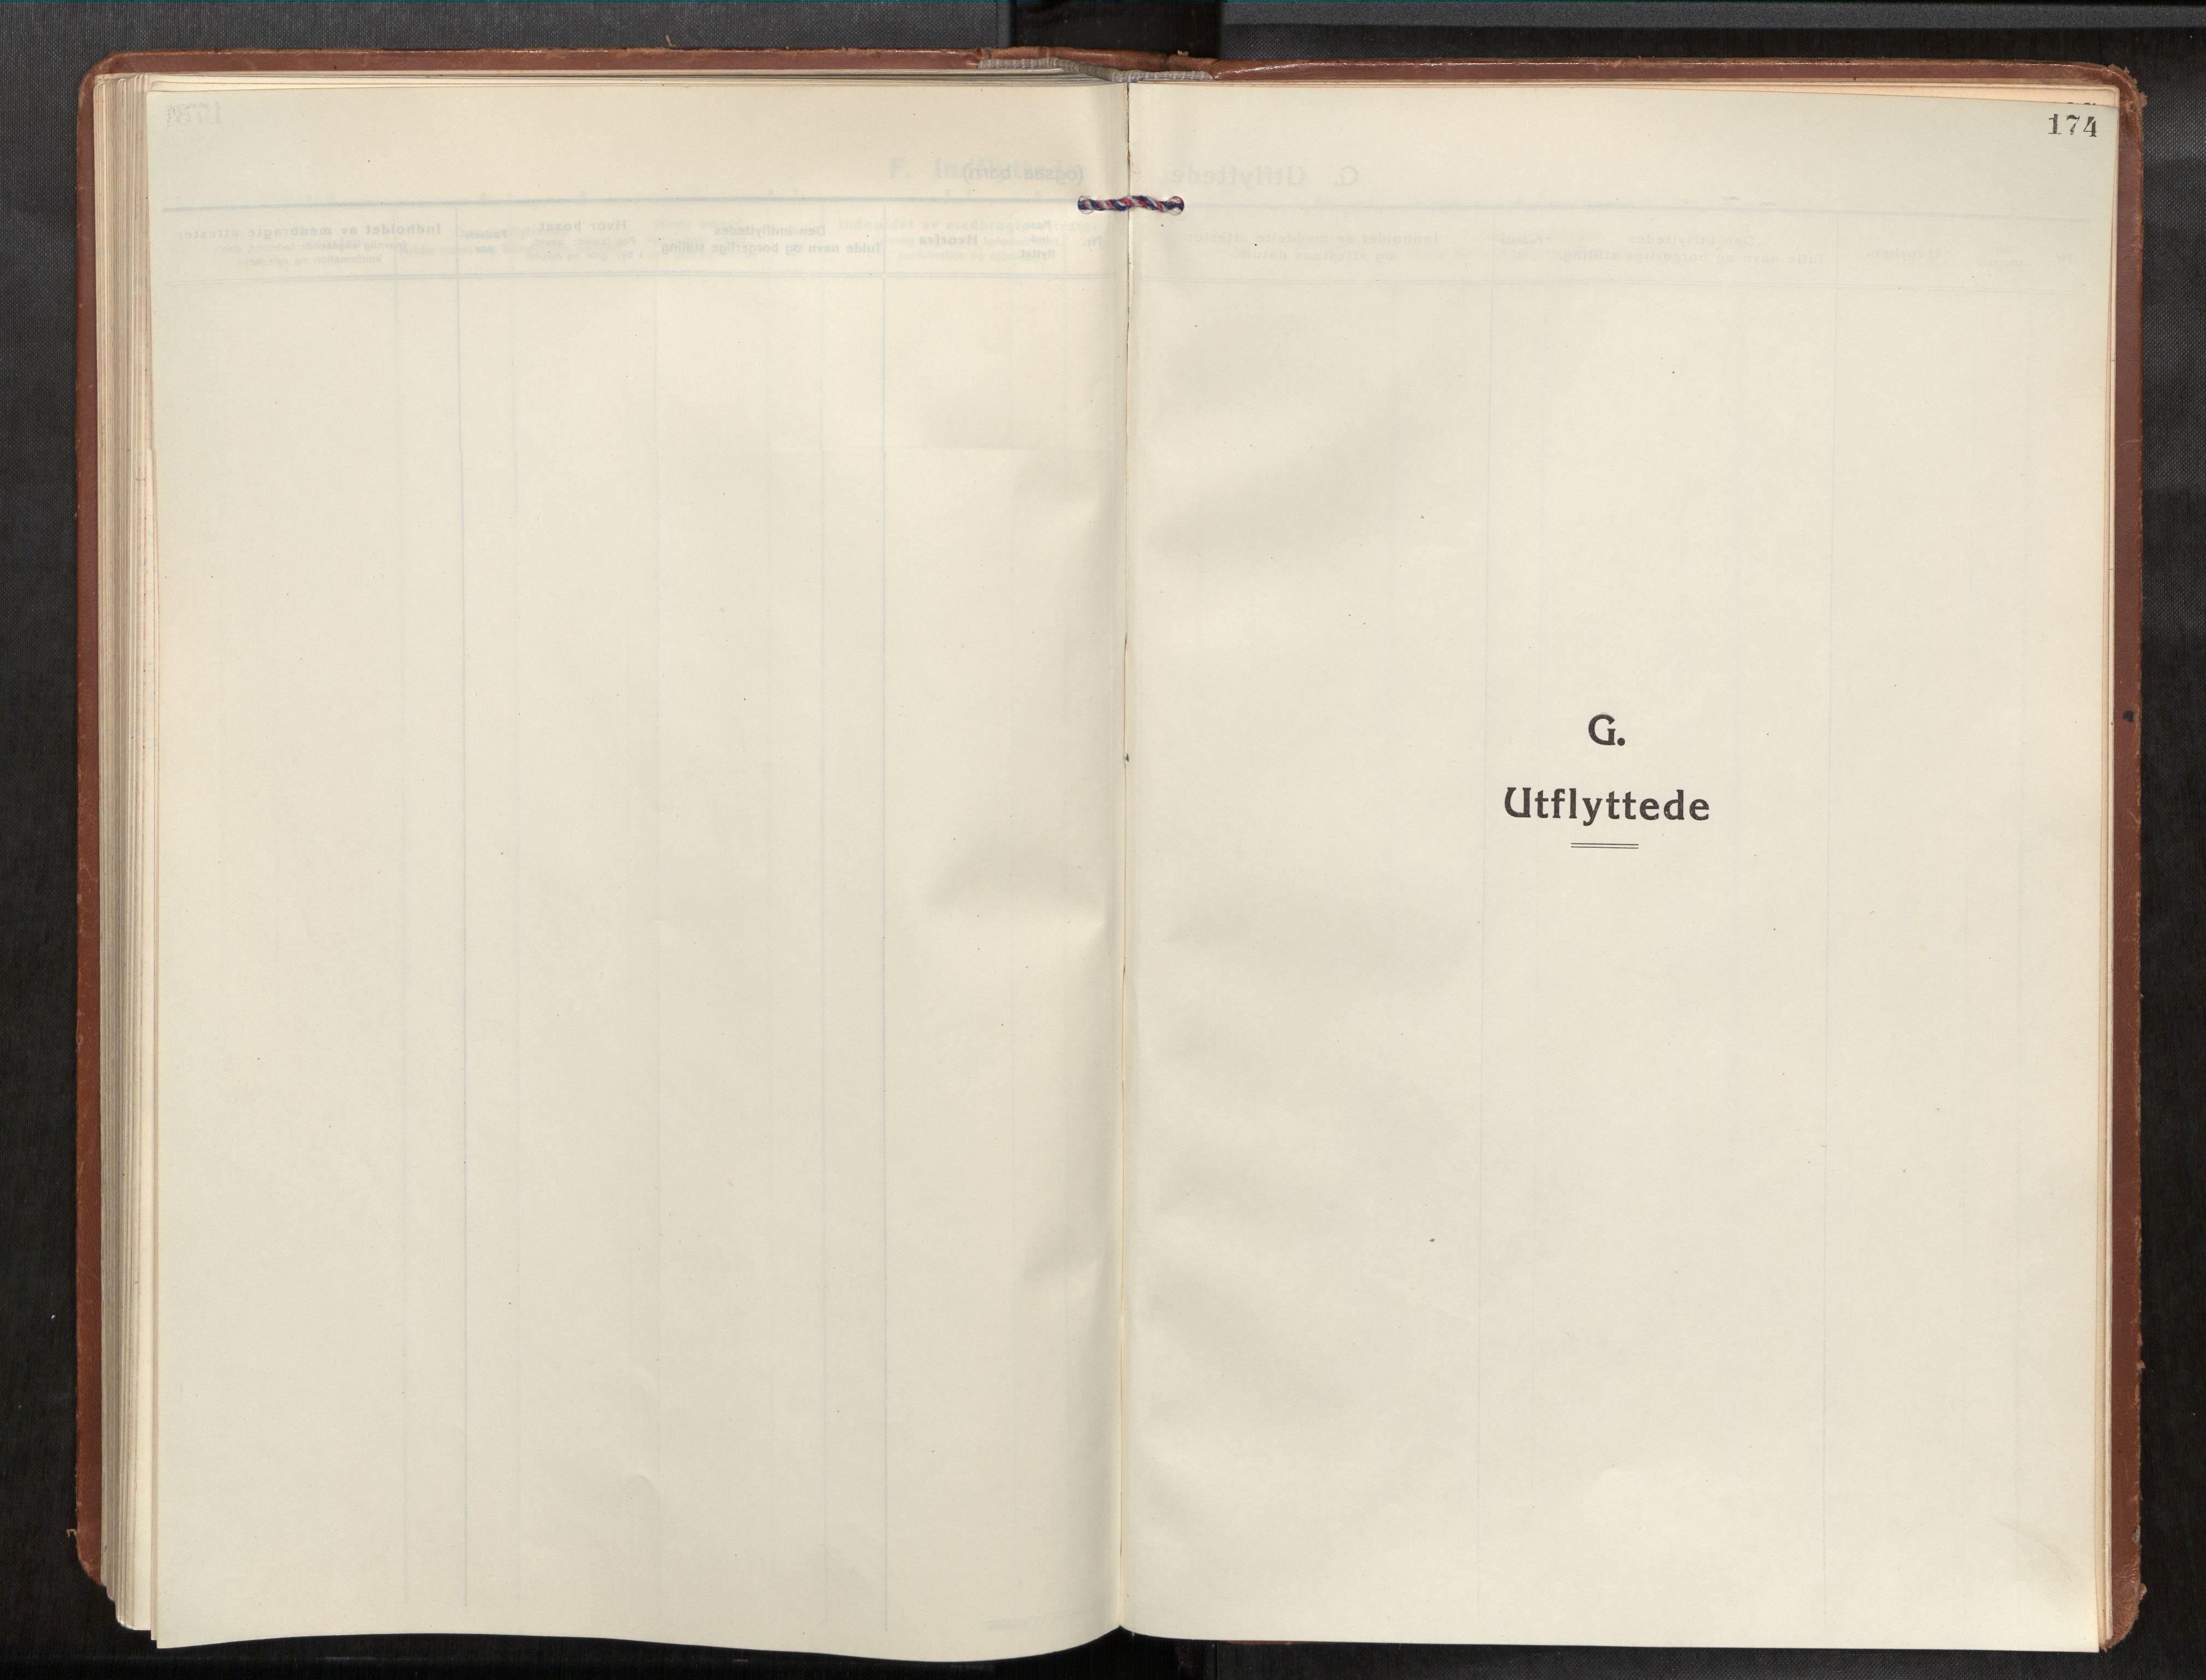 SAT, Frosta sokneprestkontor, H/Haa/L0001: Ministerialbok nr. 1, 1926-1934, s. 174